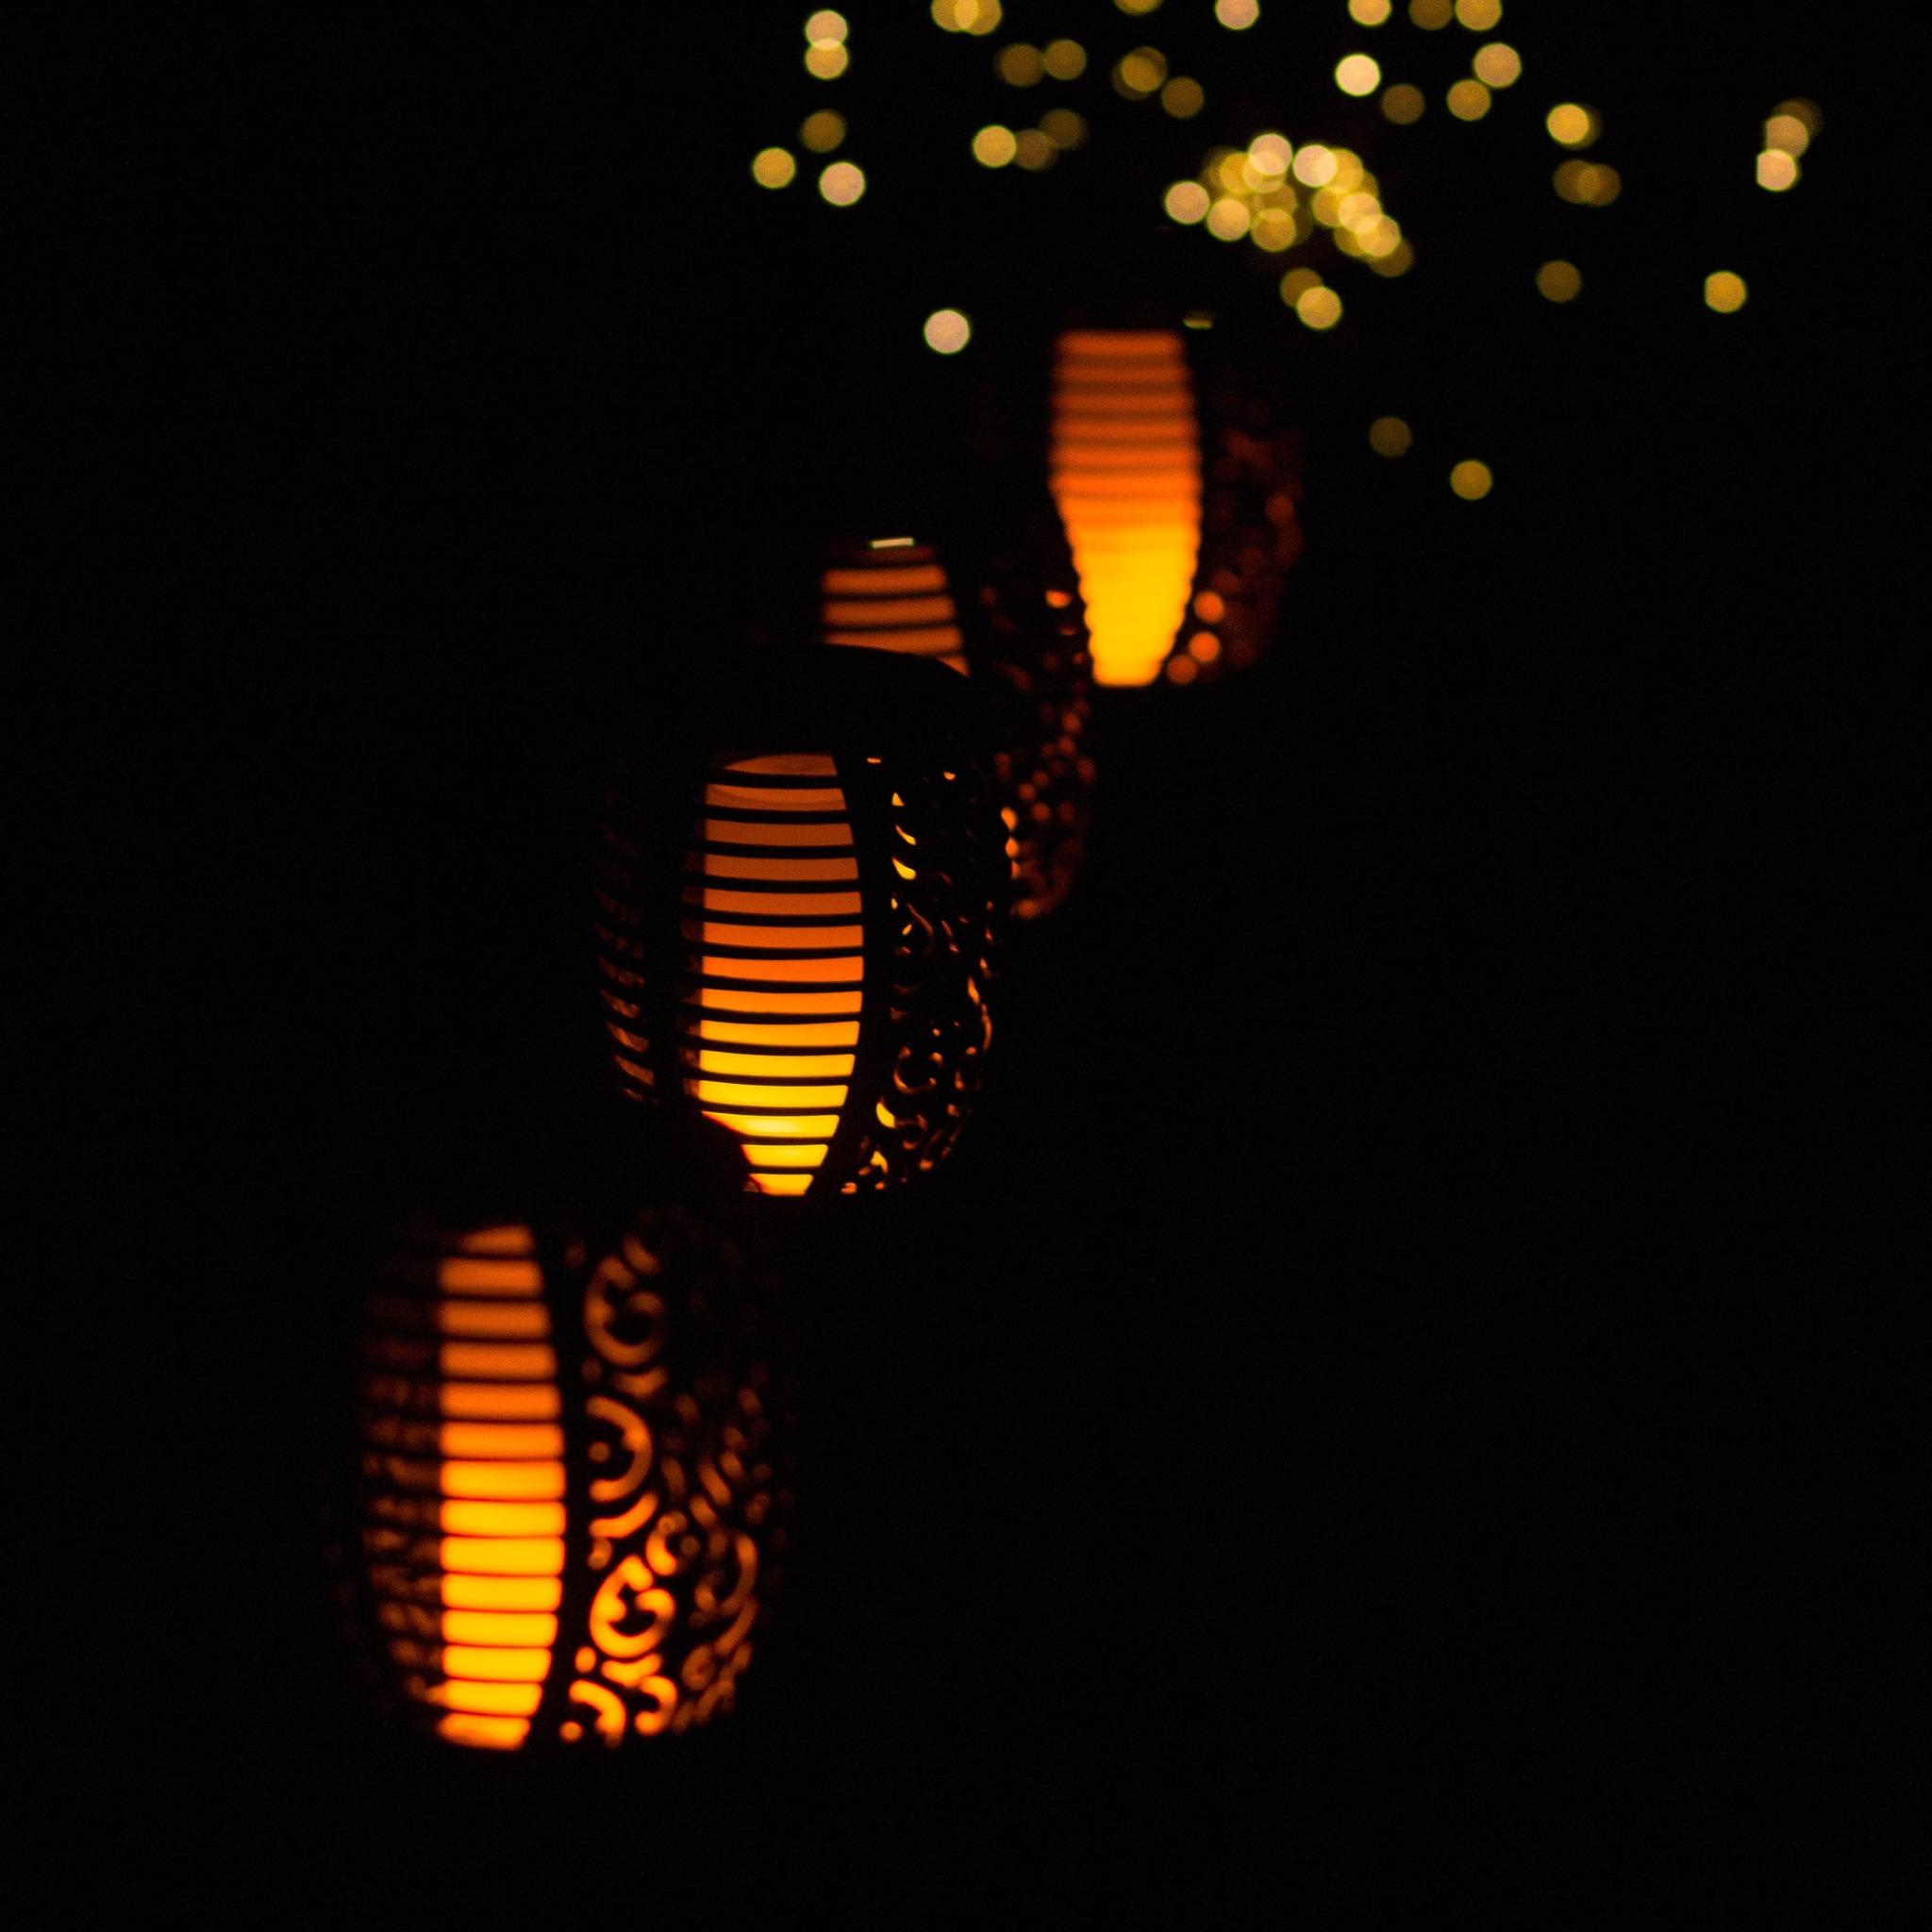 Светильник-факел EPECOLED с эффектом пламени (на солнечной батарее, 96LED)